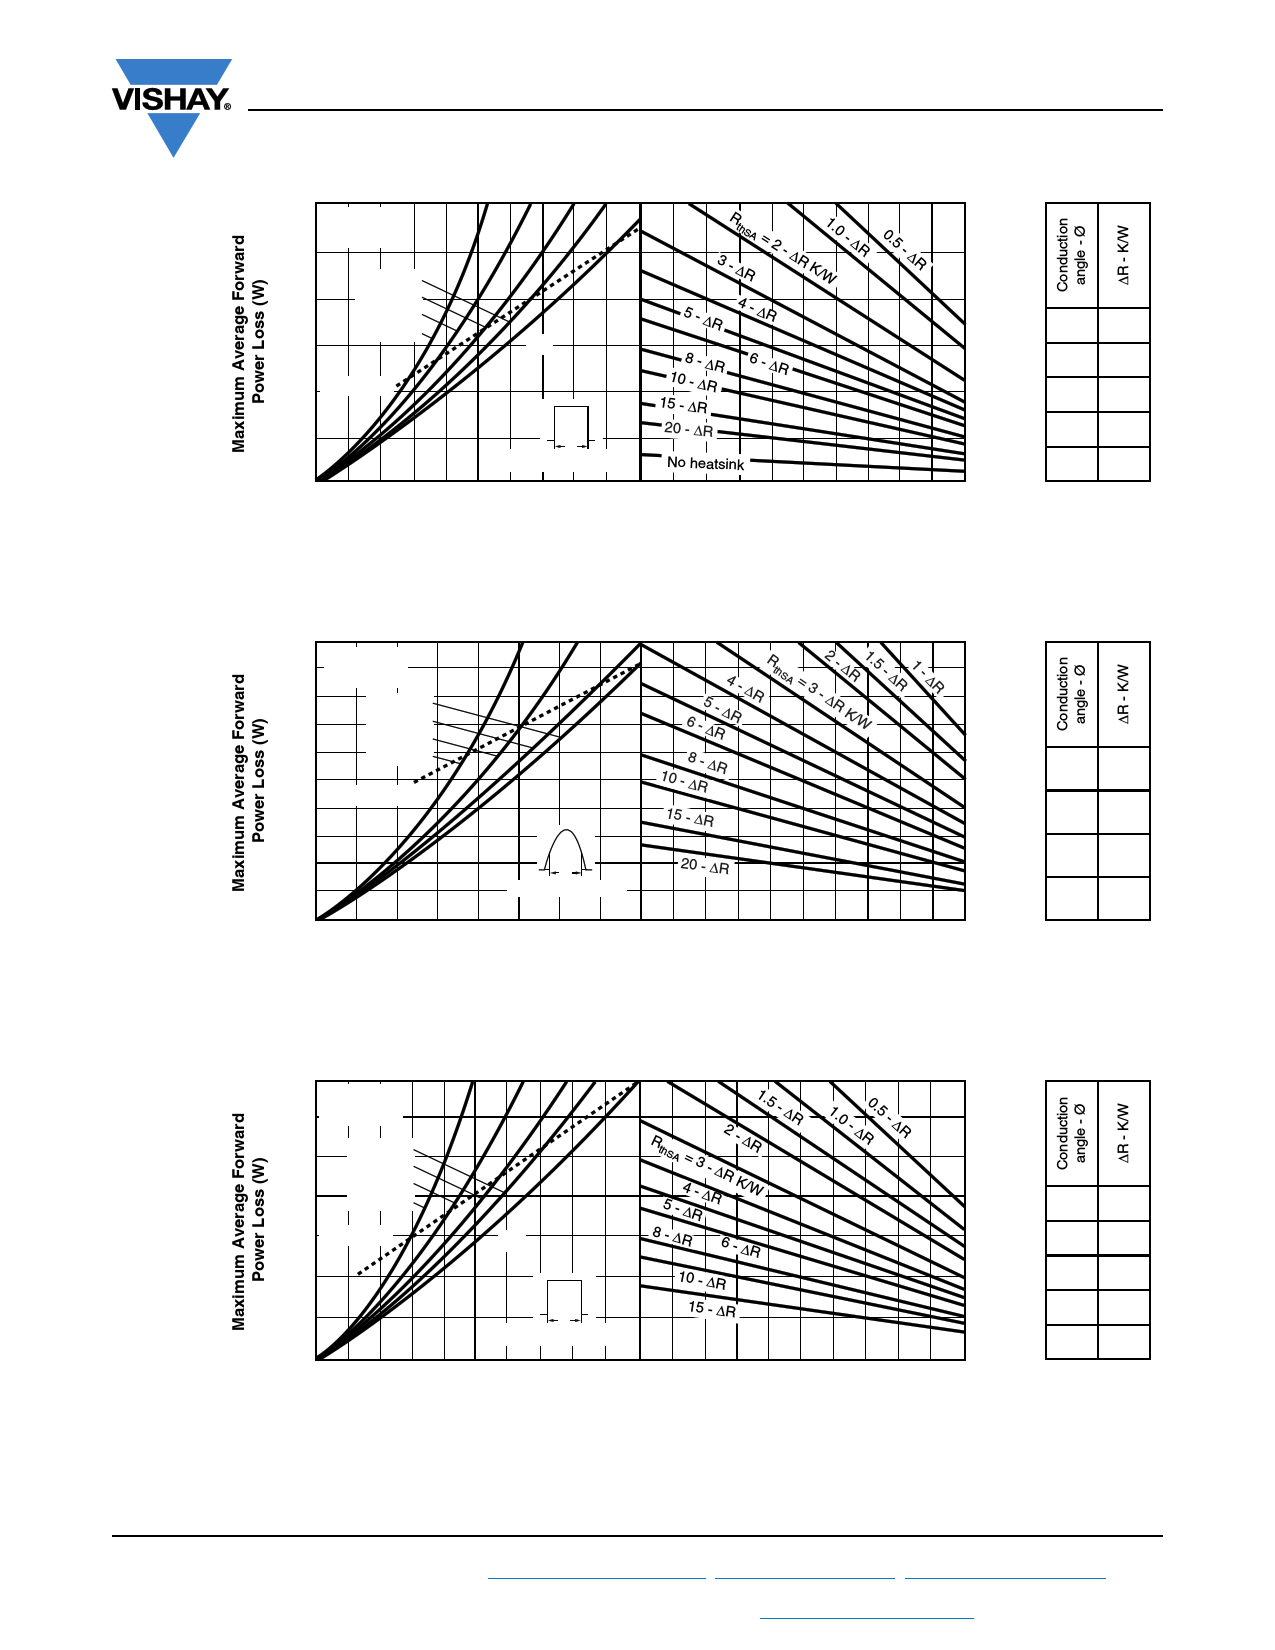 VS-1N3892 pdf